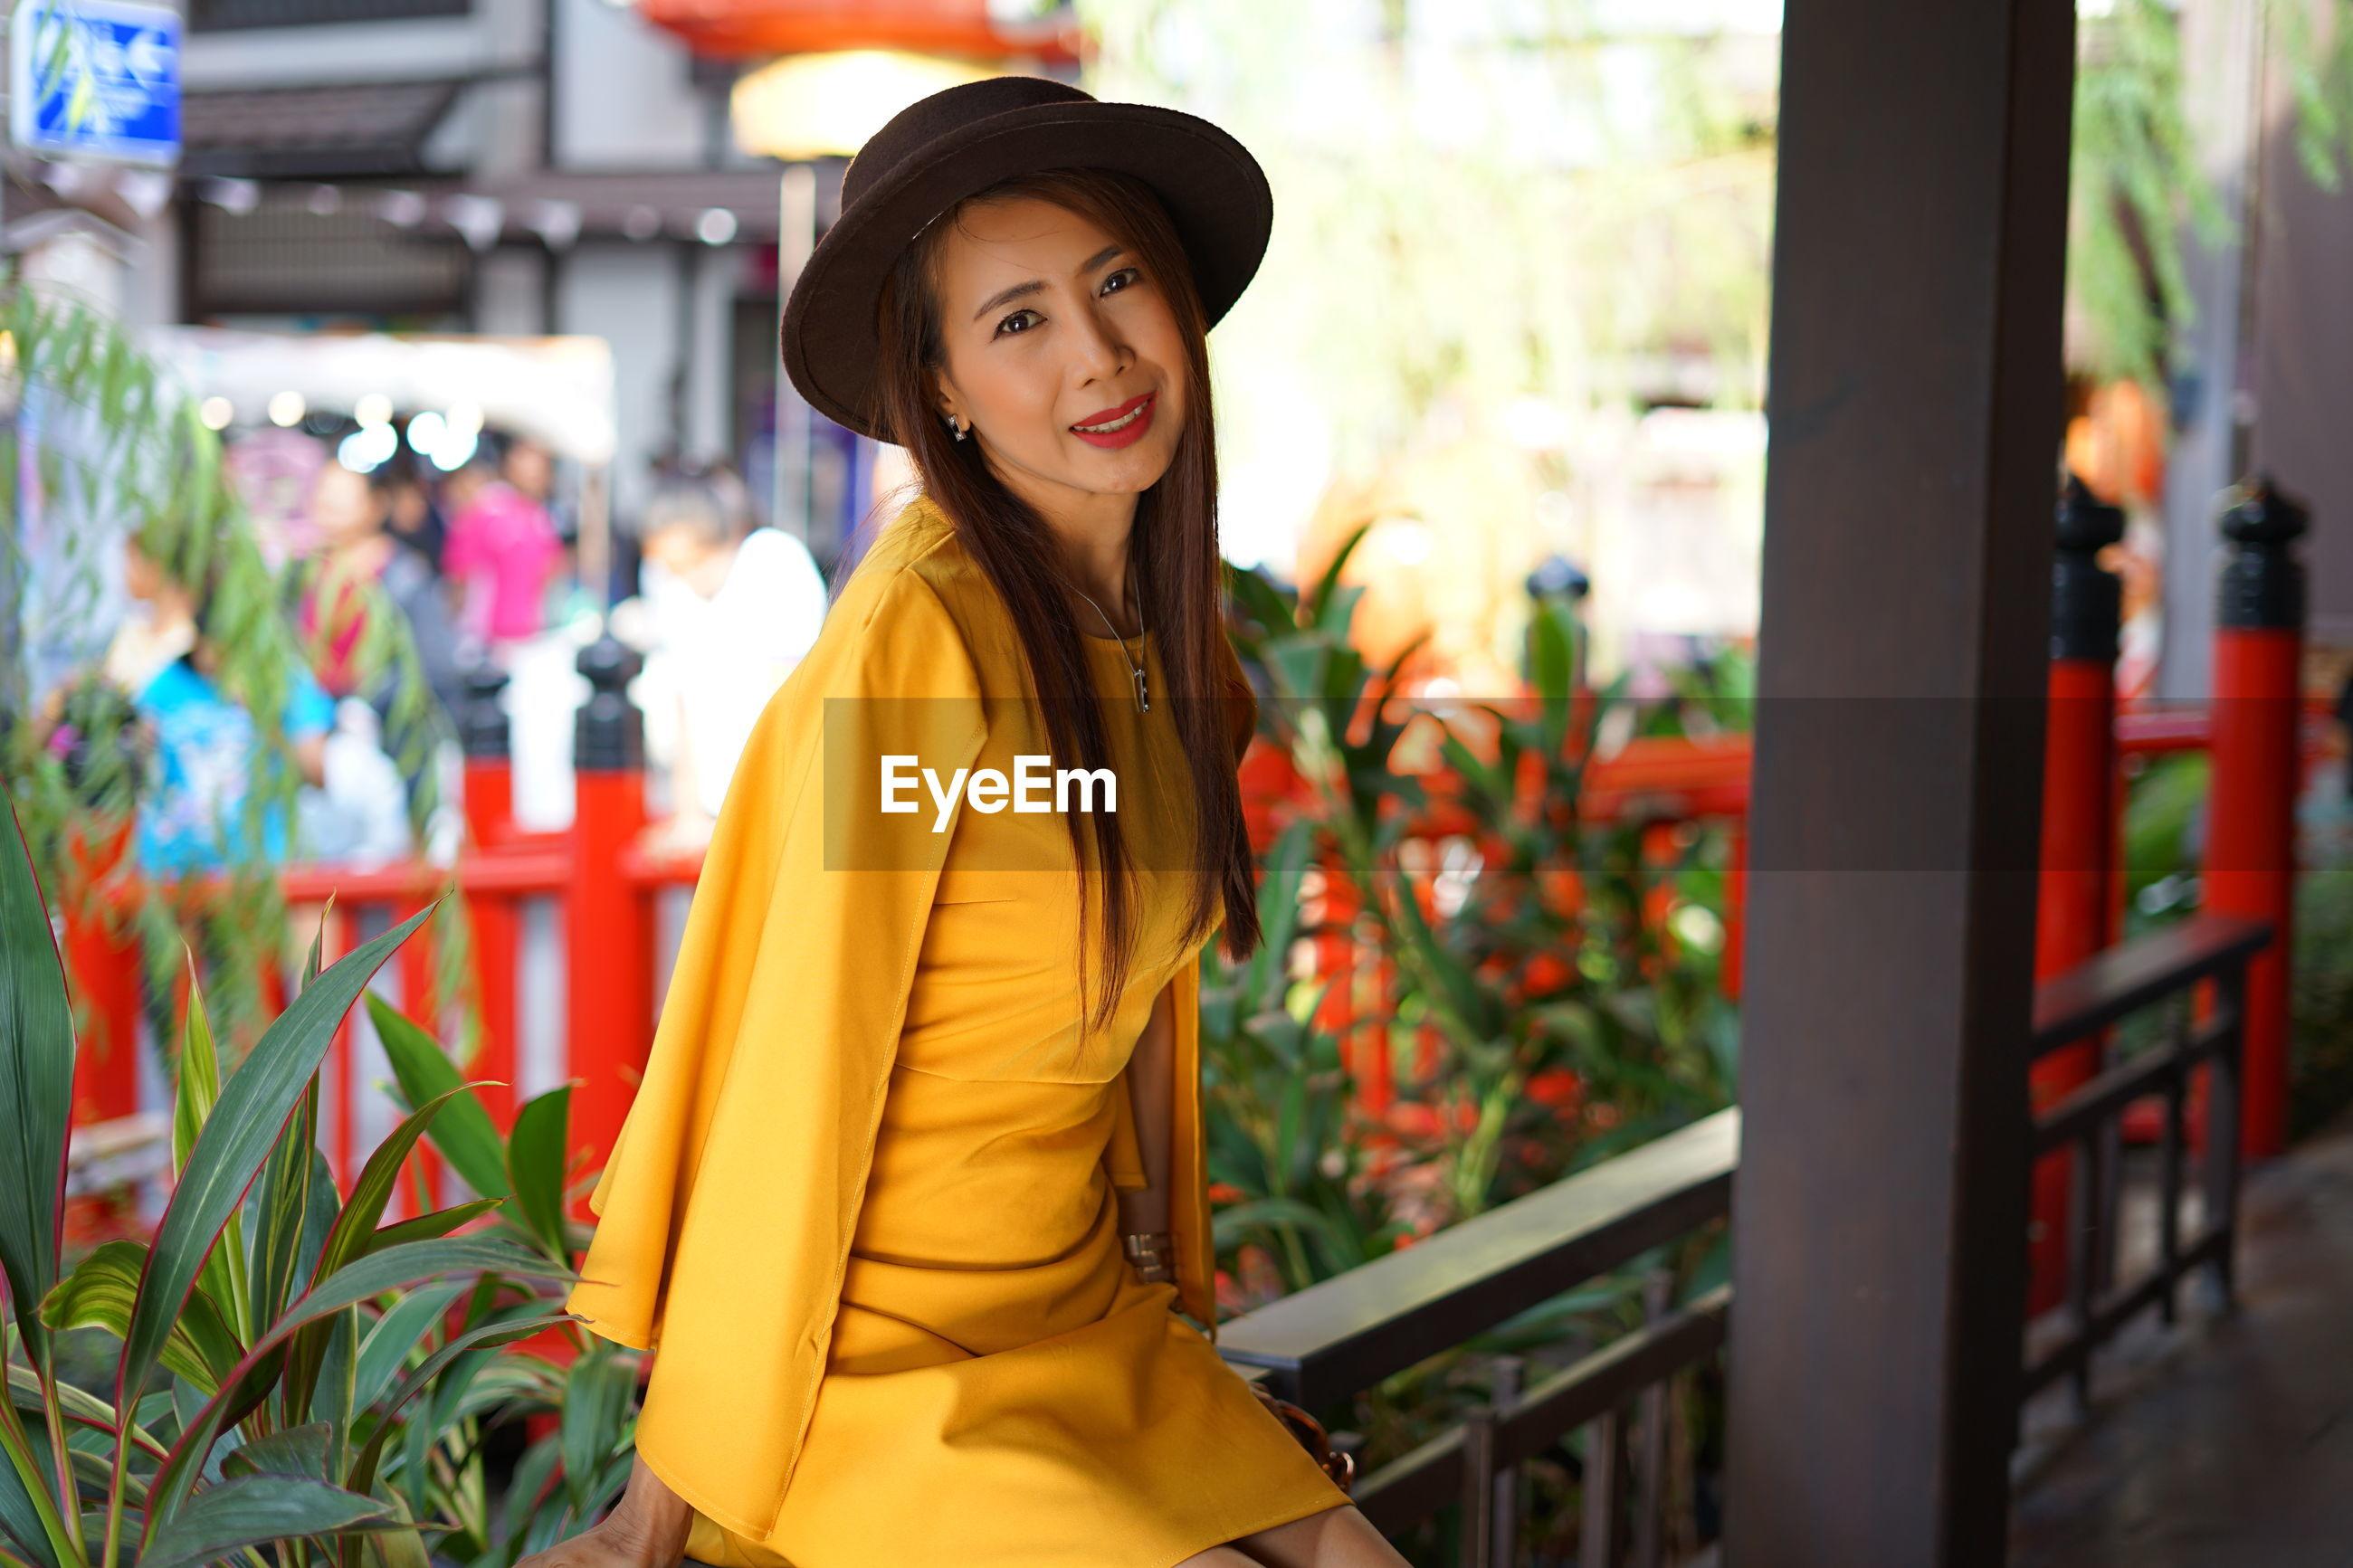 Portrait of woman in yellow dress sitting on railing